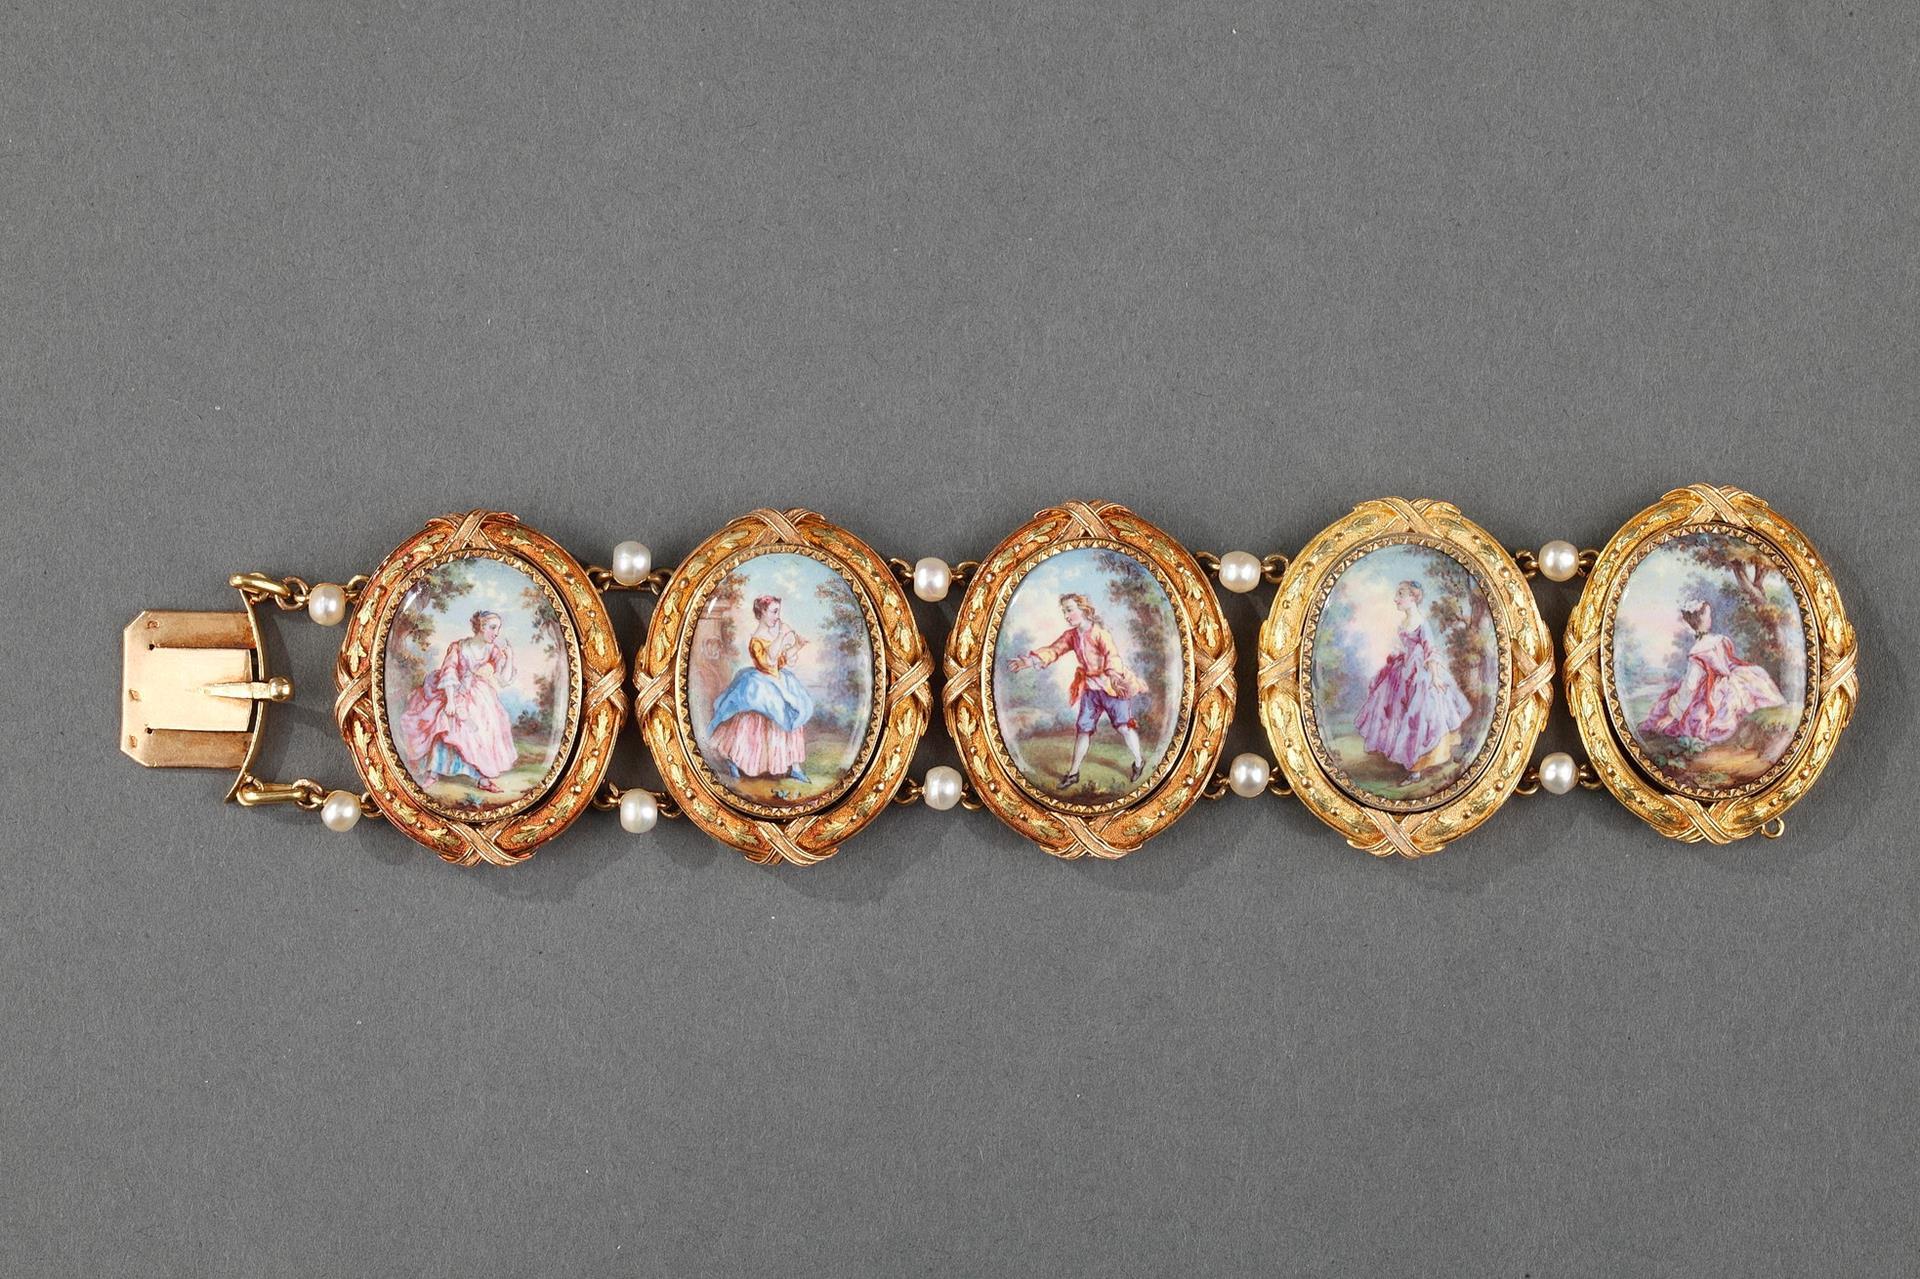 Gold and enamel bracelet. Mid 19th century.